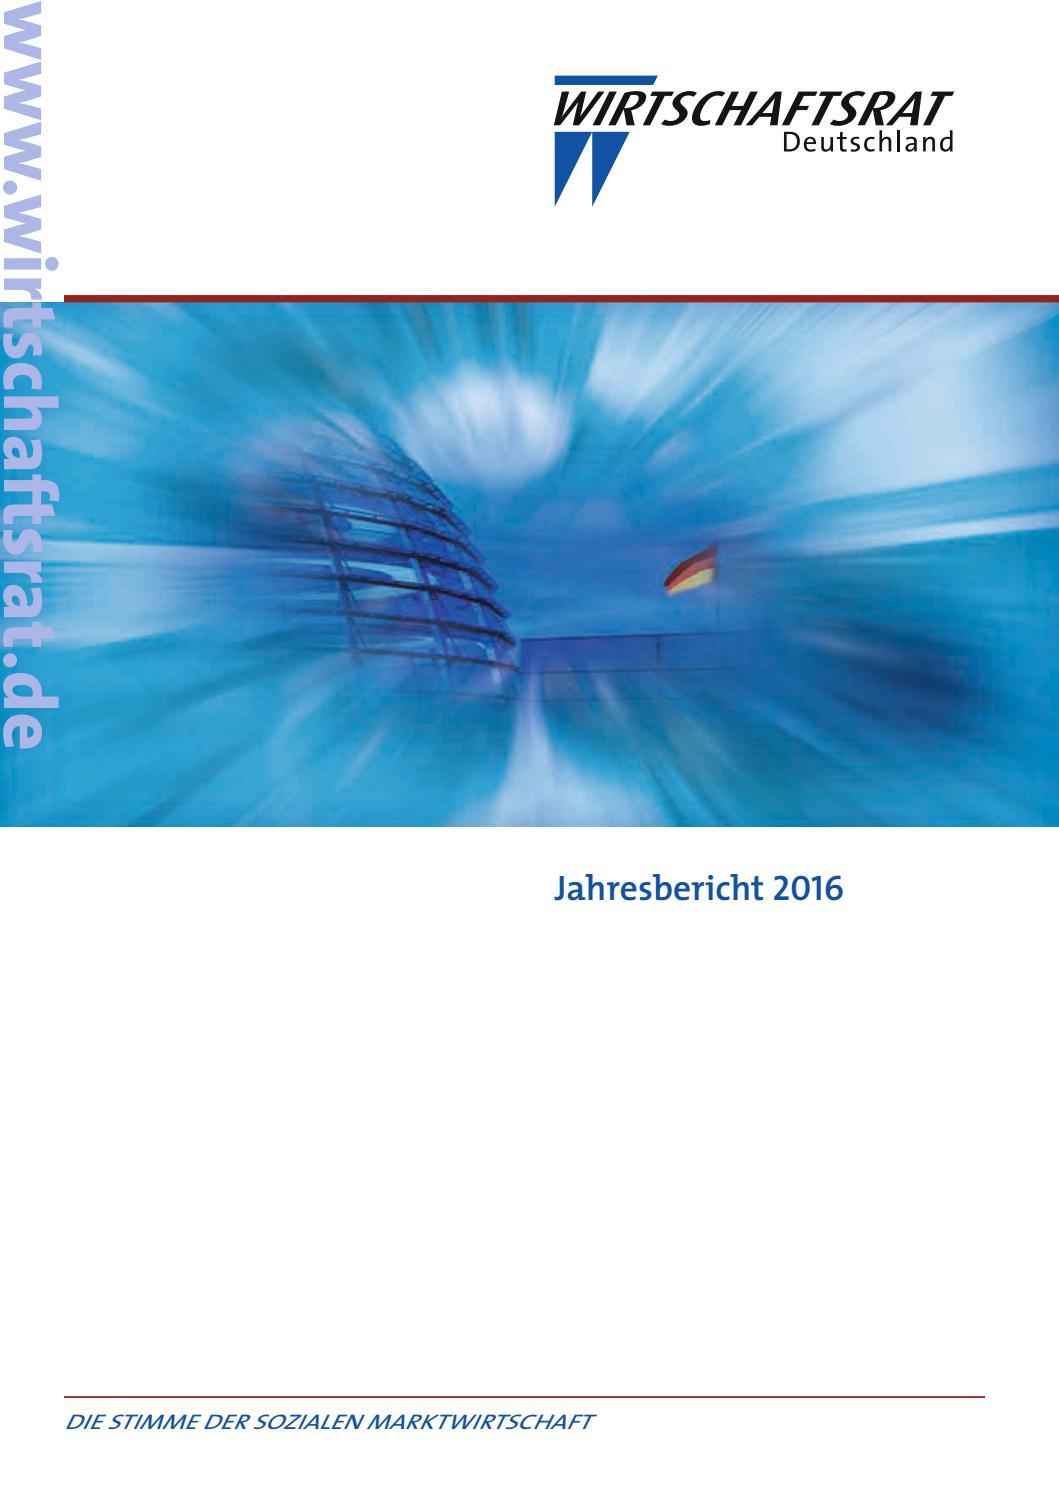 1700962 Wr Jb16 Rgb 150dpi By Wirtschaftsrat Der Cdu E V Issuu